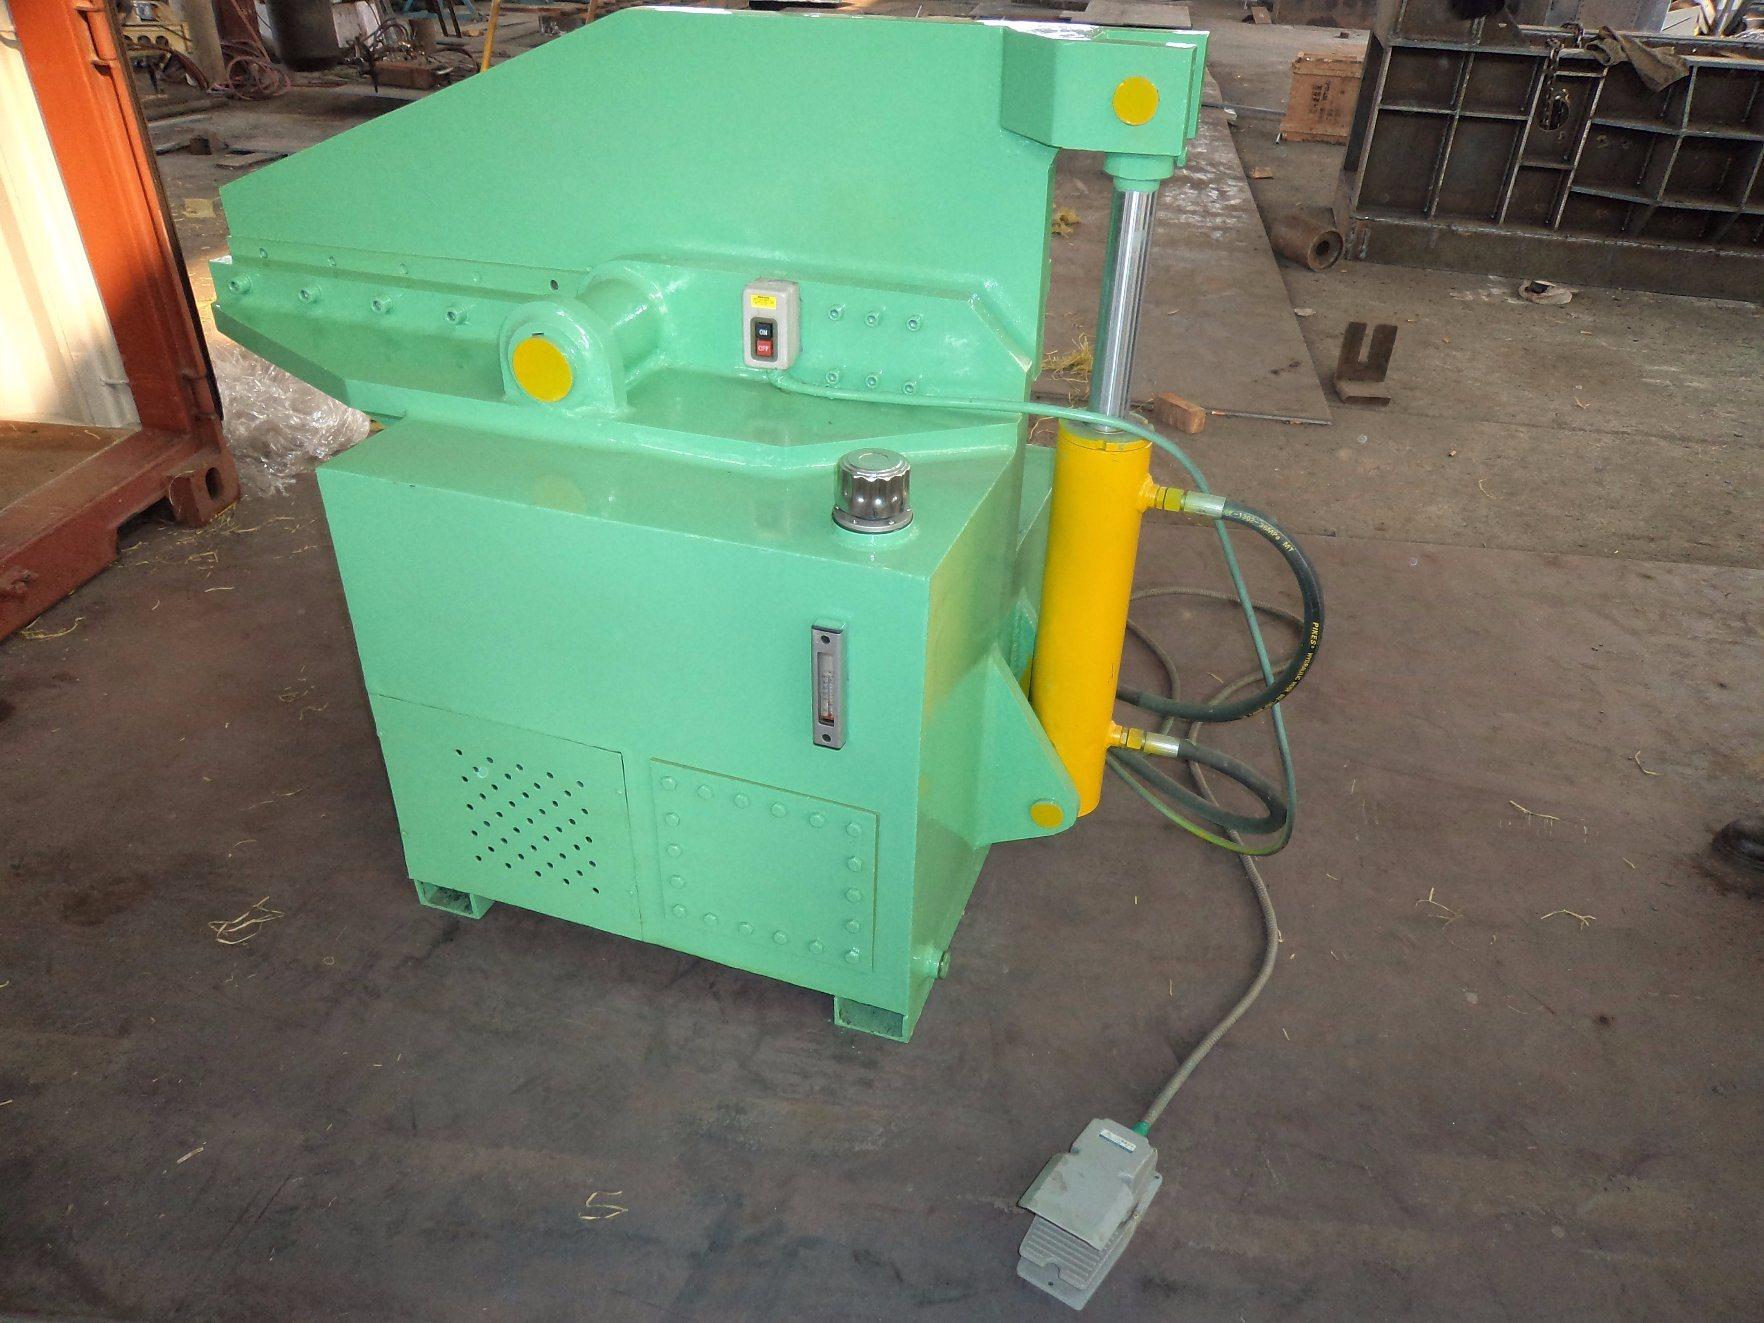 Hydraulic Alligator Cutting Machine Scrap Metal Shear for Scrap Metal Recycling